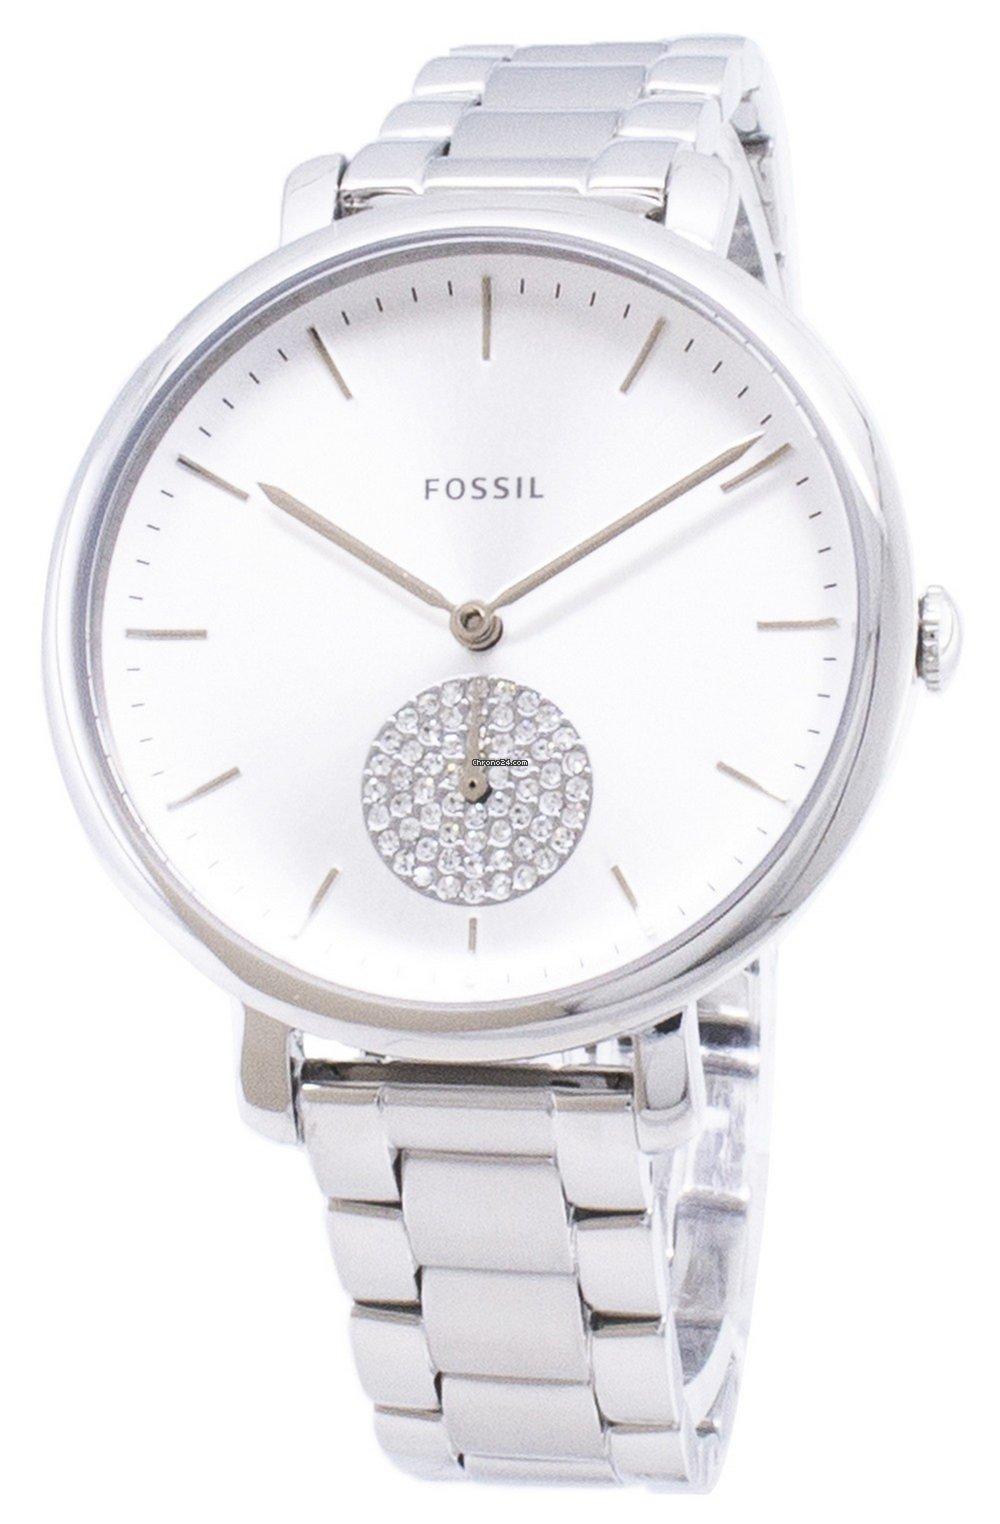 61f0ab673c9b Fossil Jacqueline ES4437 Quartz Analog Women s Watch en venta por MX ...